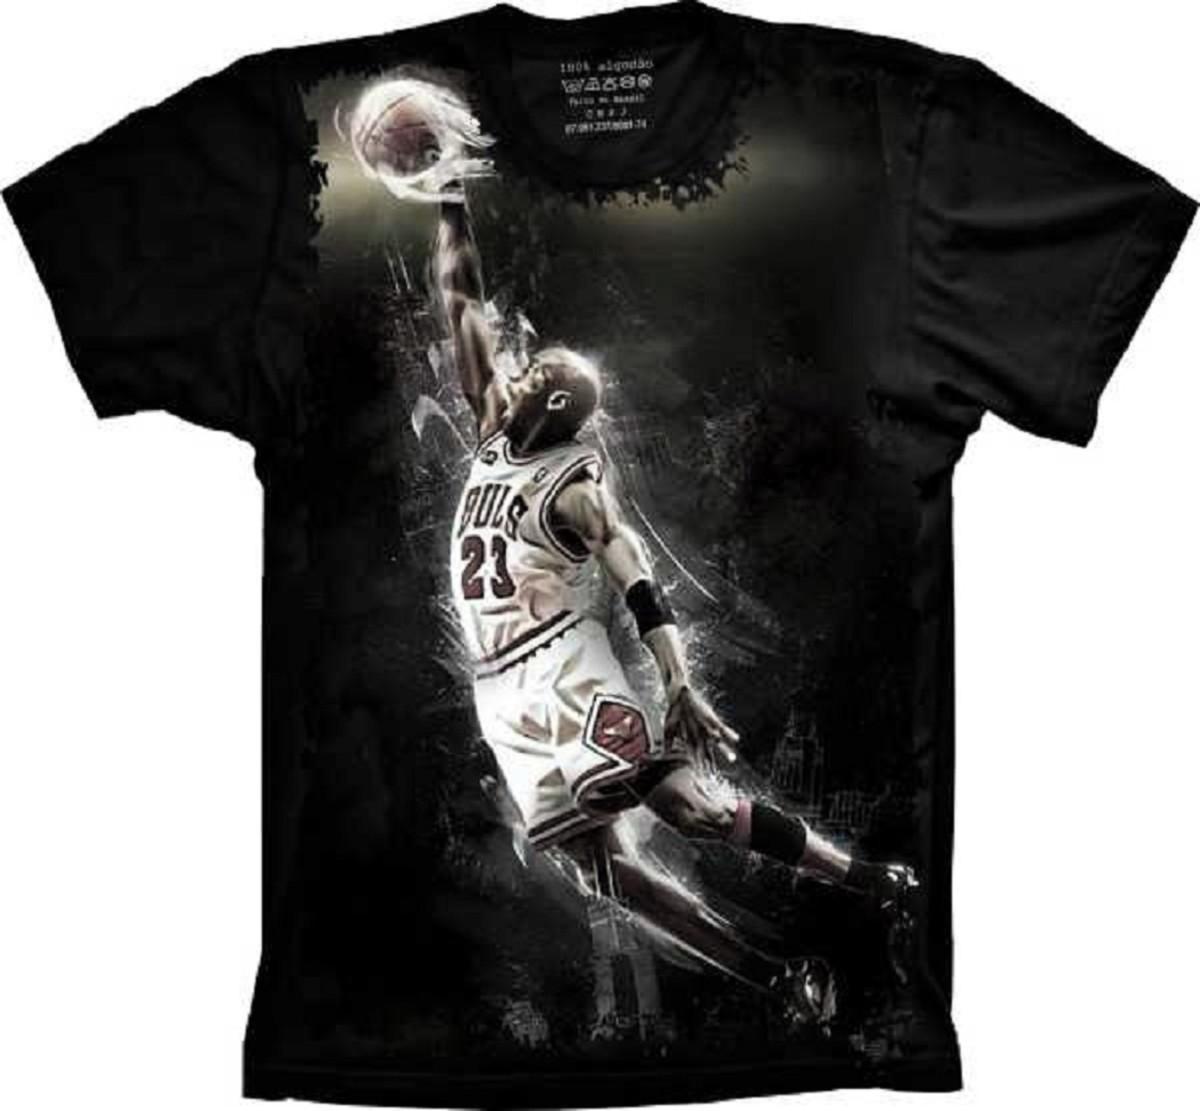 40d71f3091e Camiseta Chicago Bulls Basquete Michael Jordan no Elo7